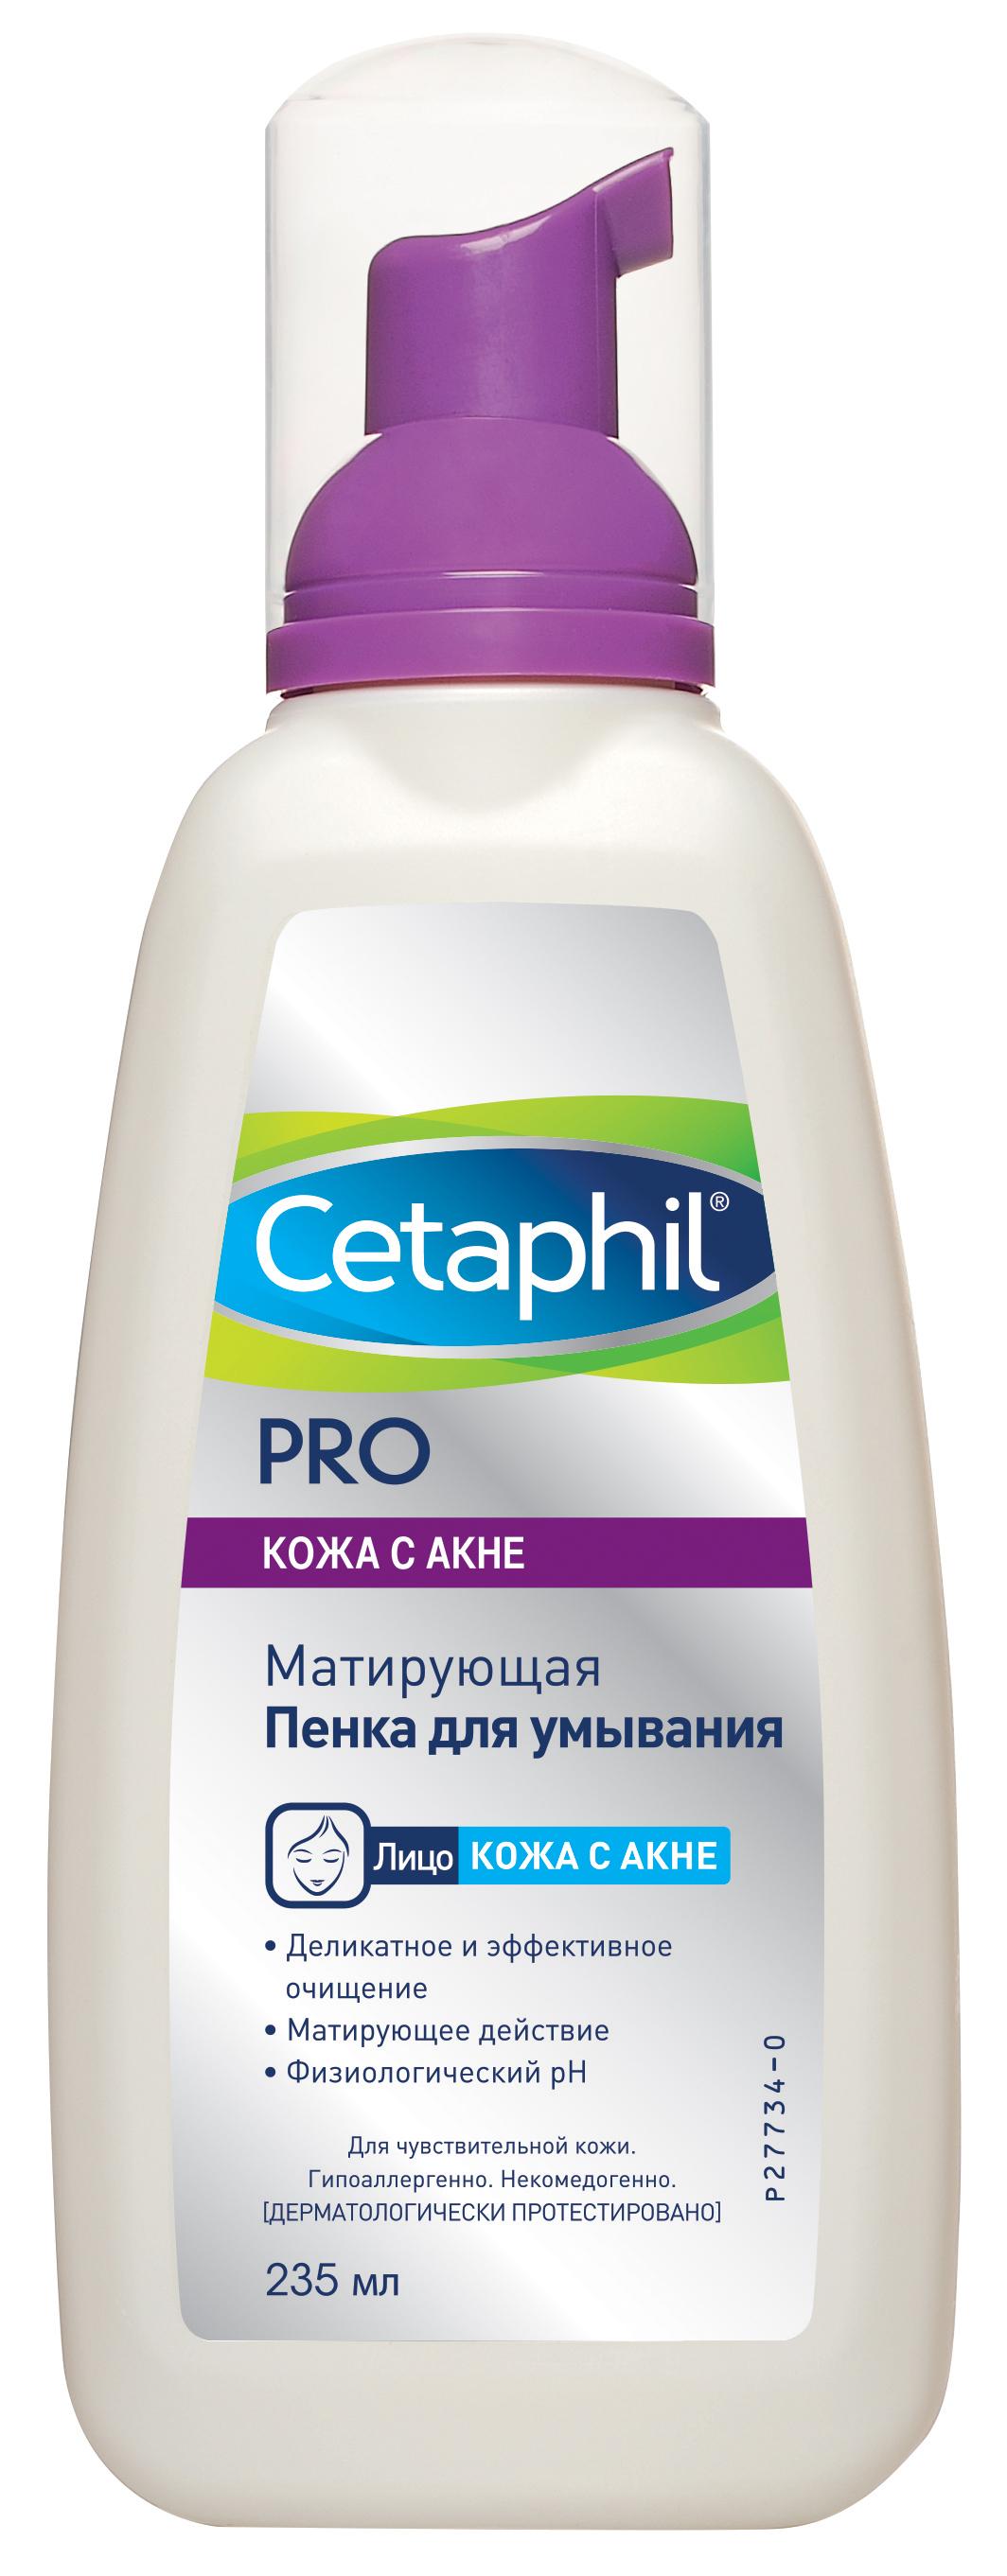 Cetaphil PRO пенка для умывания матирующая 235мл